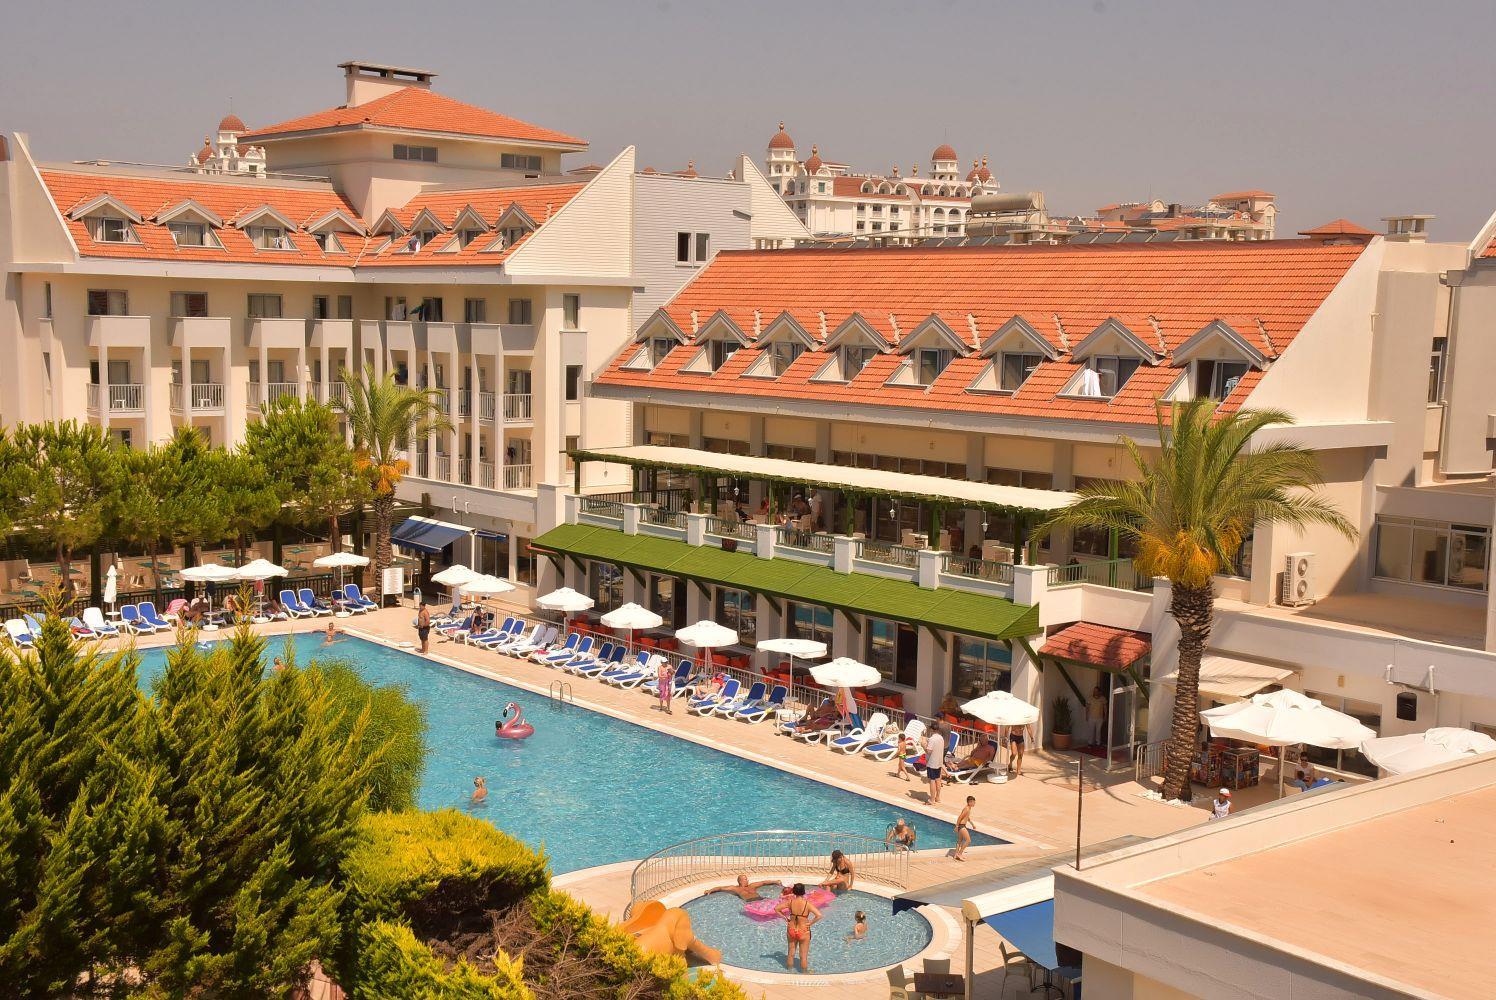 http://www.orextravel.sk/OREX/hotelphotos/seher-sun-beach-general-0014.jpg